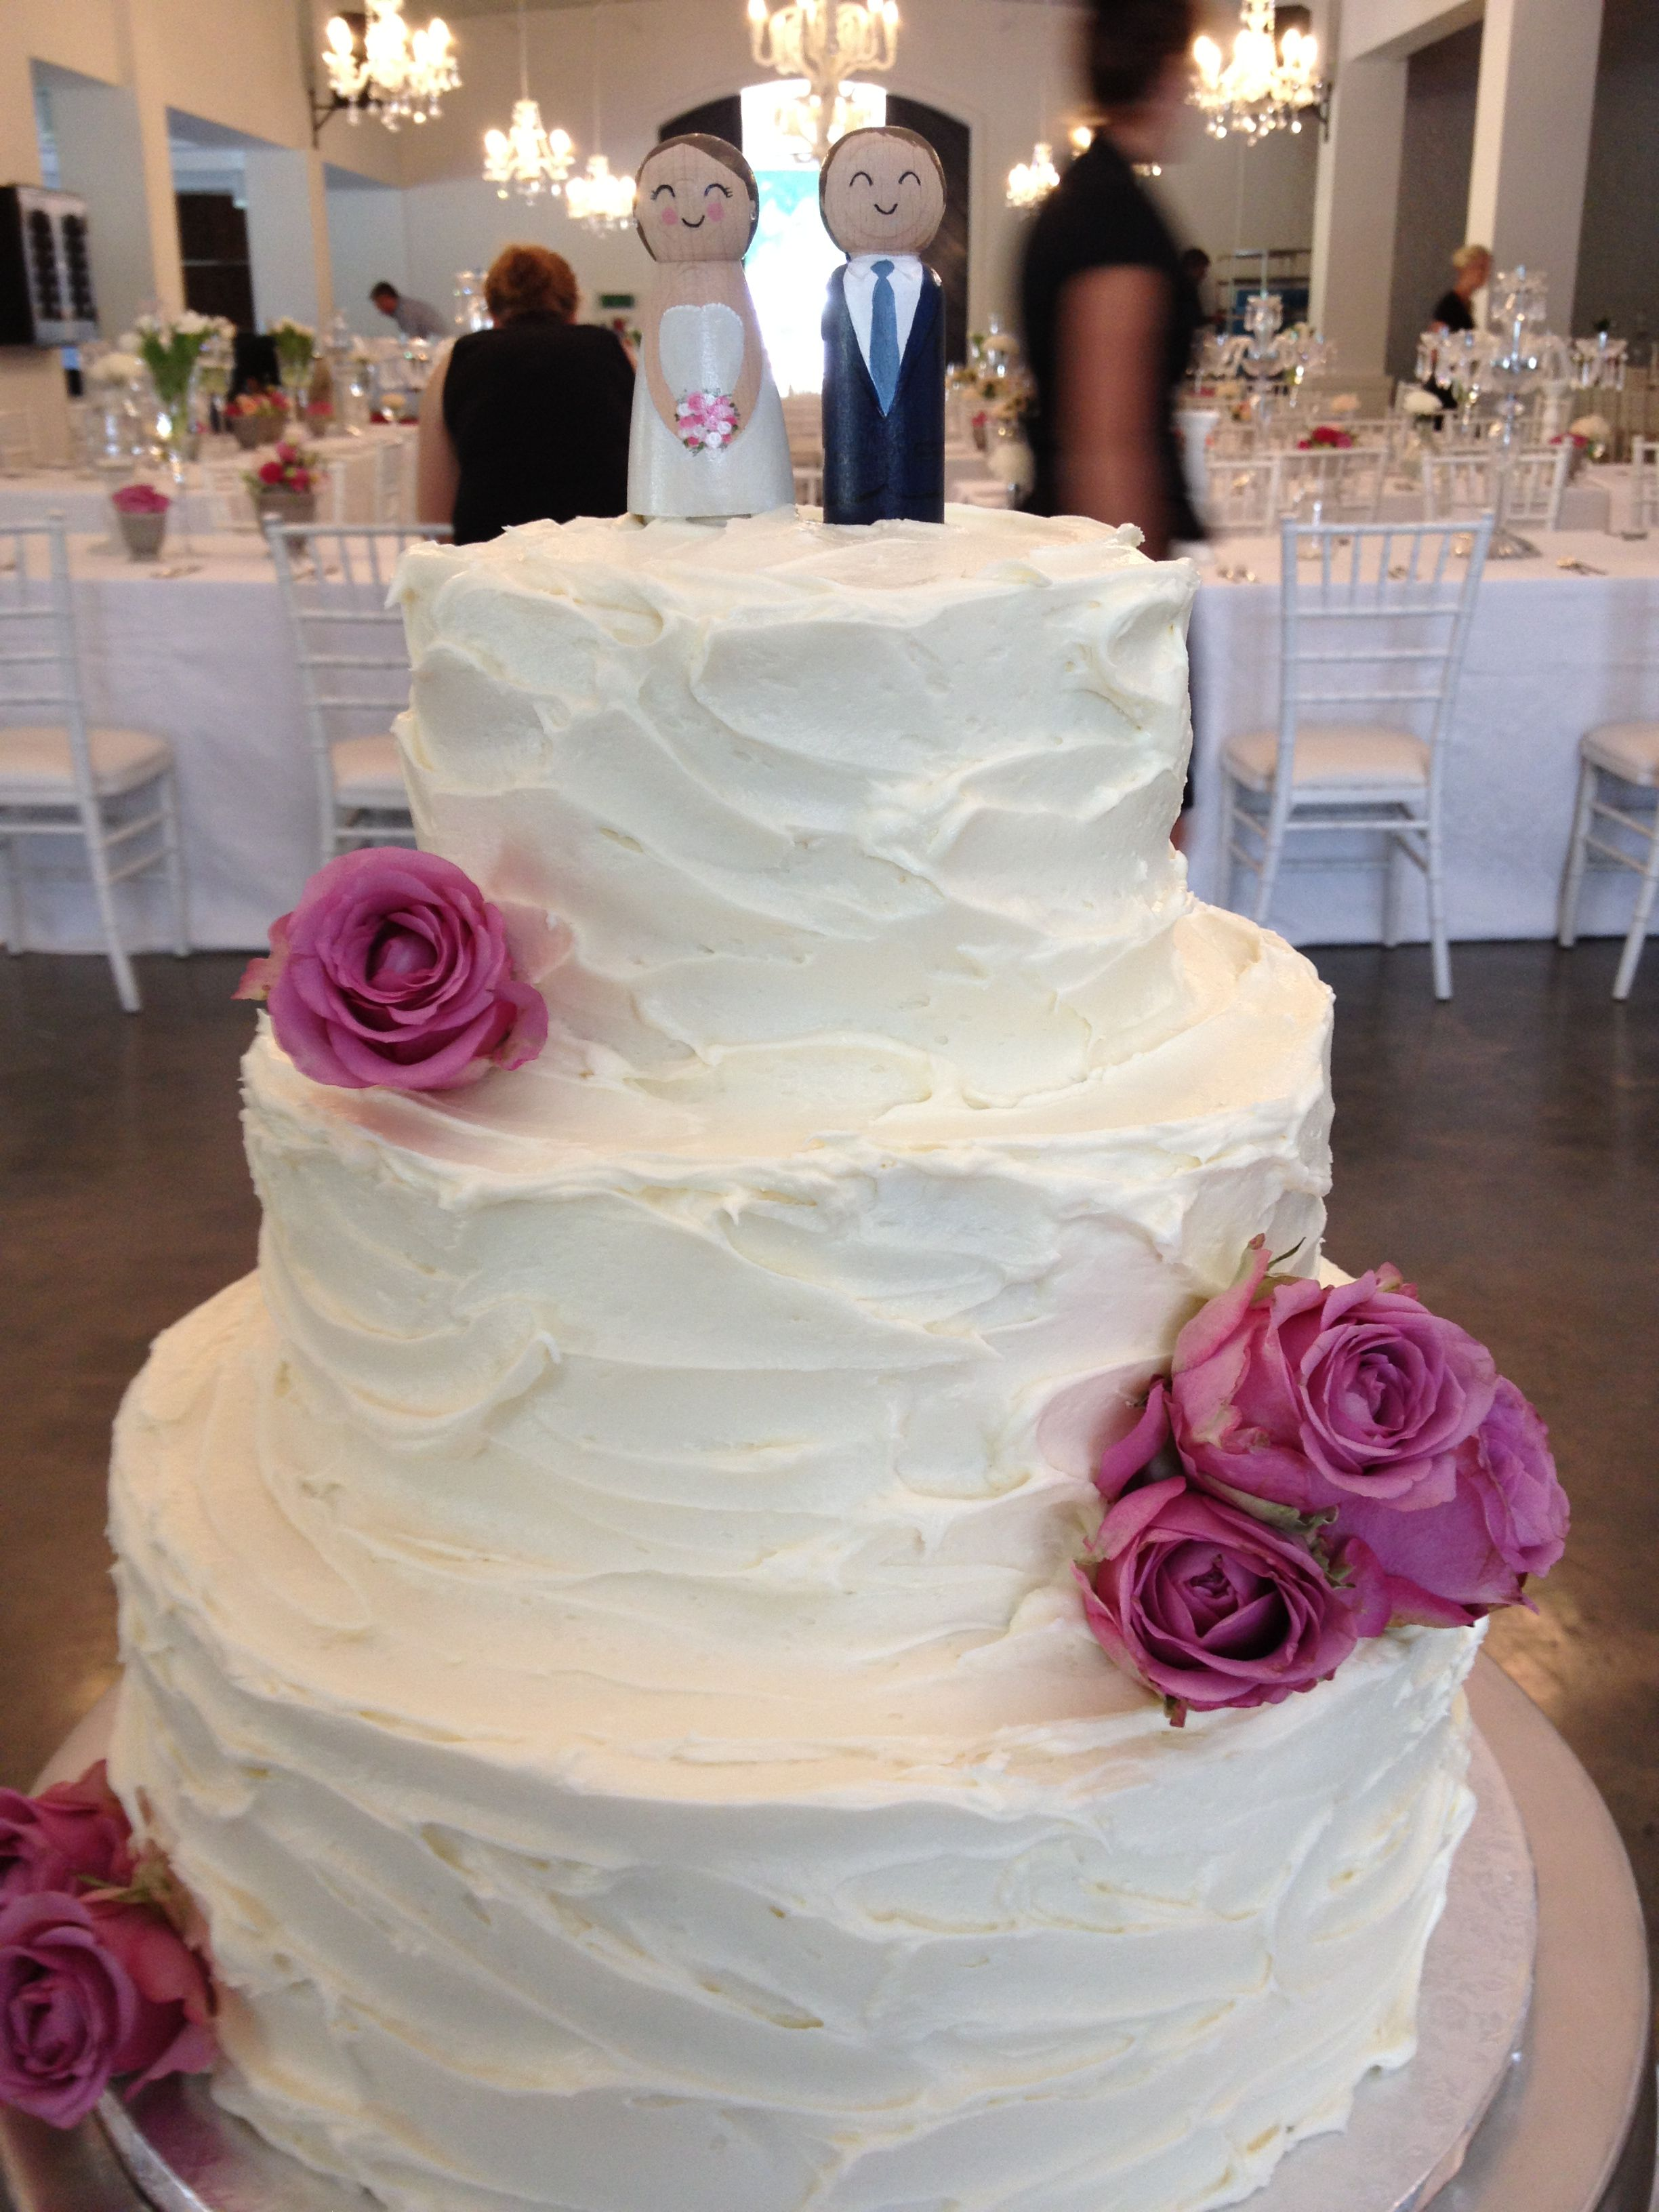 Wedding Cake Frosting Wedding Ideas Wedding Cake Frosting Wedding Cake Frosting Recipe Red Velvet Wedding Cake